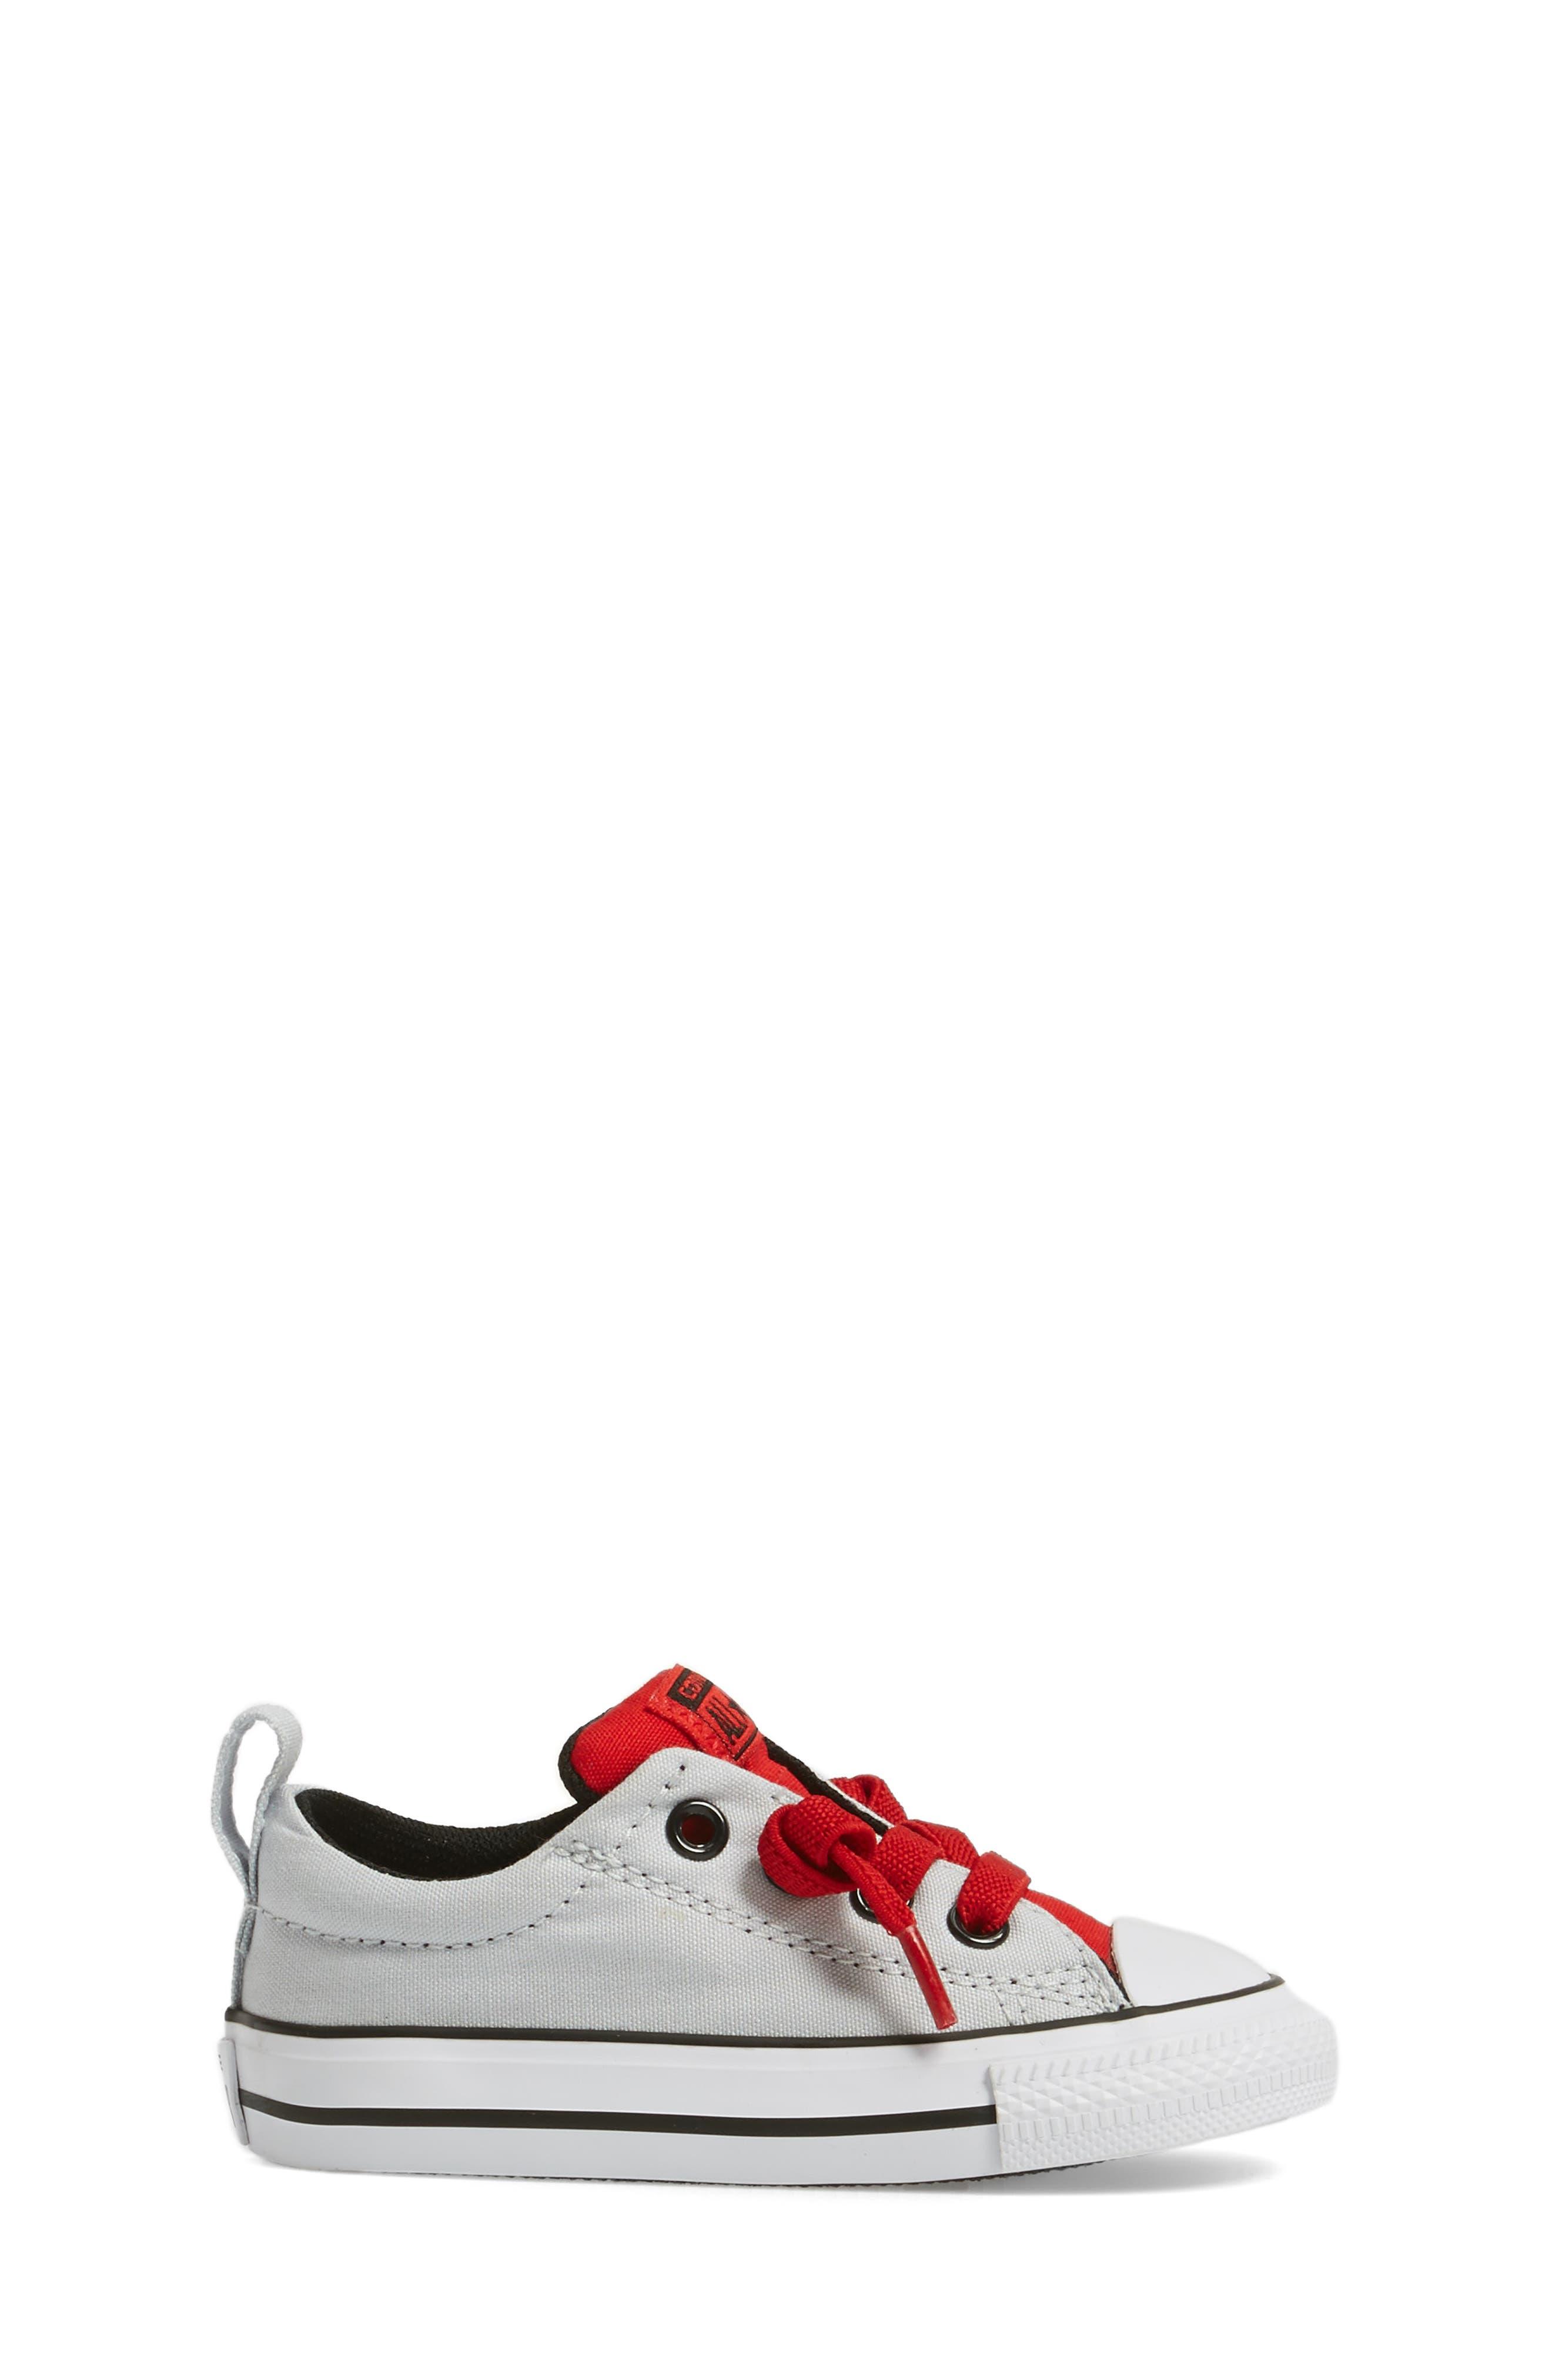 All Star<sup>®</sup> Street Slip Low Top Sneaker,                             Alternate thumbnail 3, color,                             040